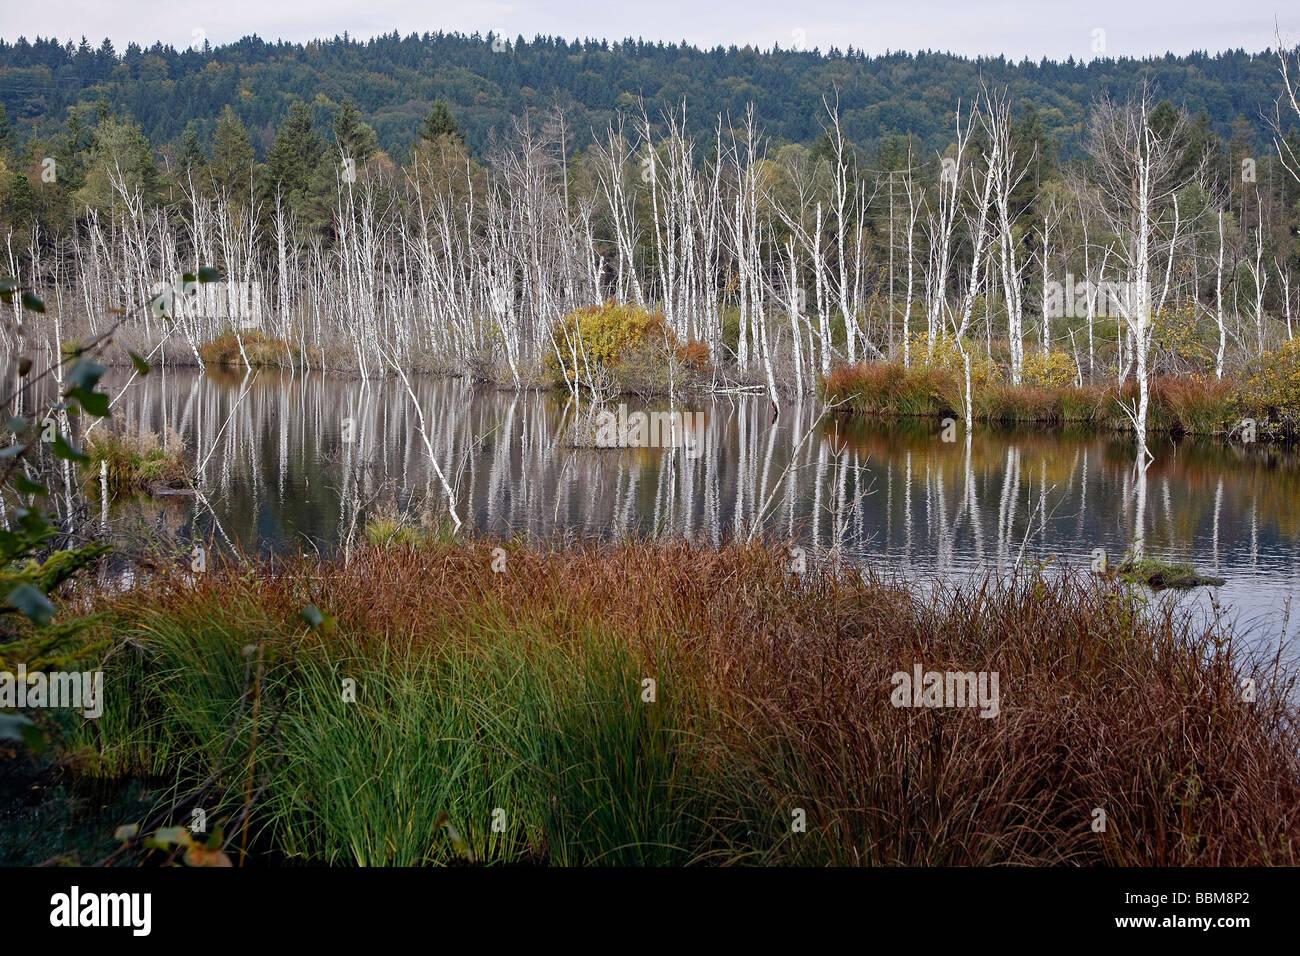 Renatured, newly wettened moor, Eglinger Filz, Bavaria, Germany Stock Photo